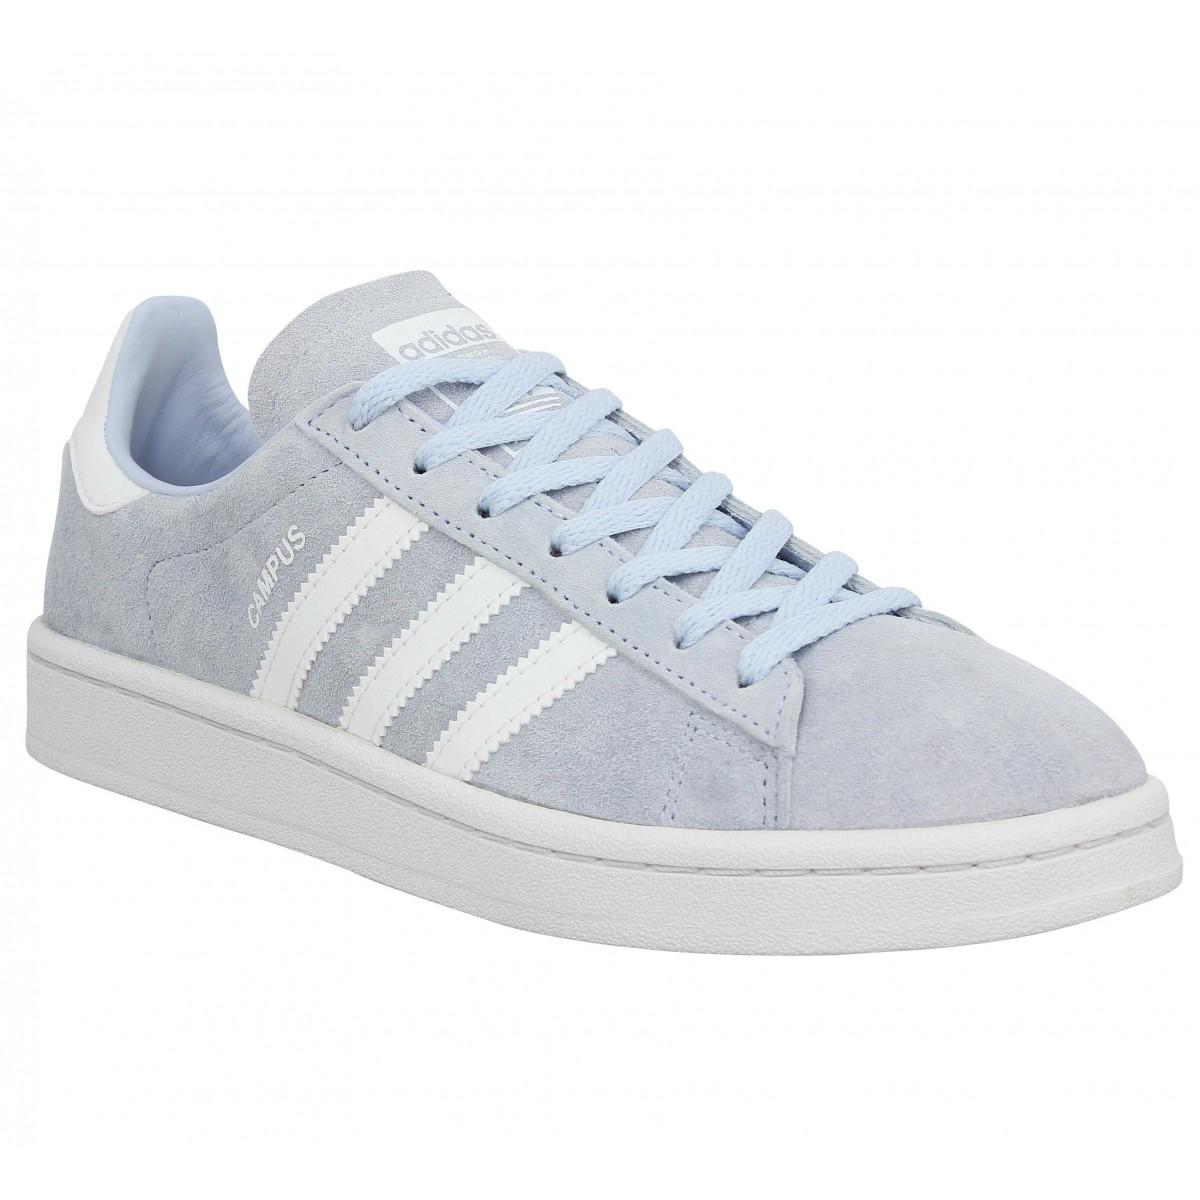 Adidas Femme Campus Velours -36-bleu